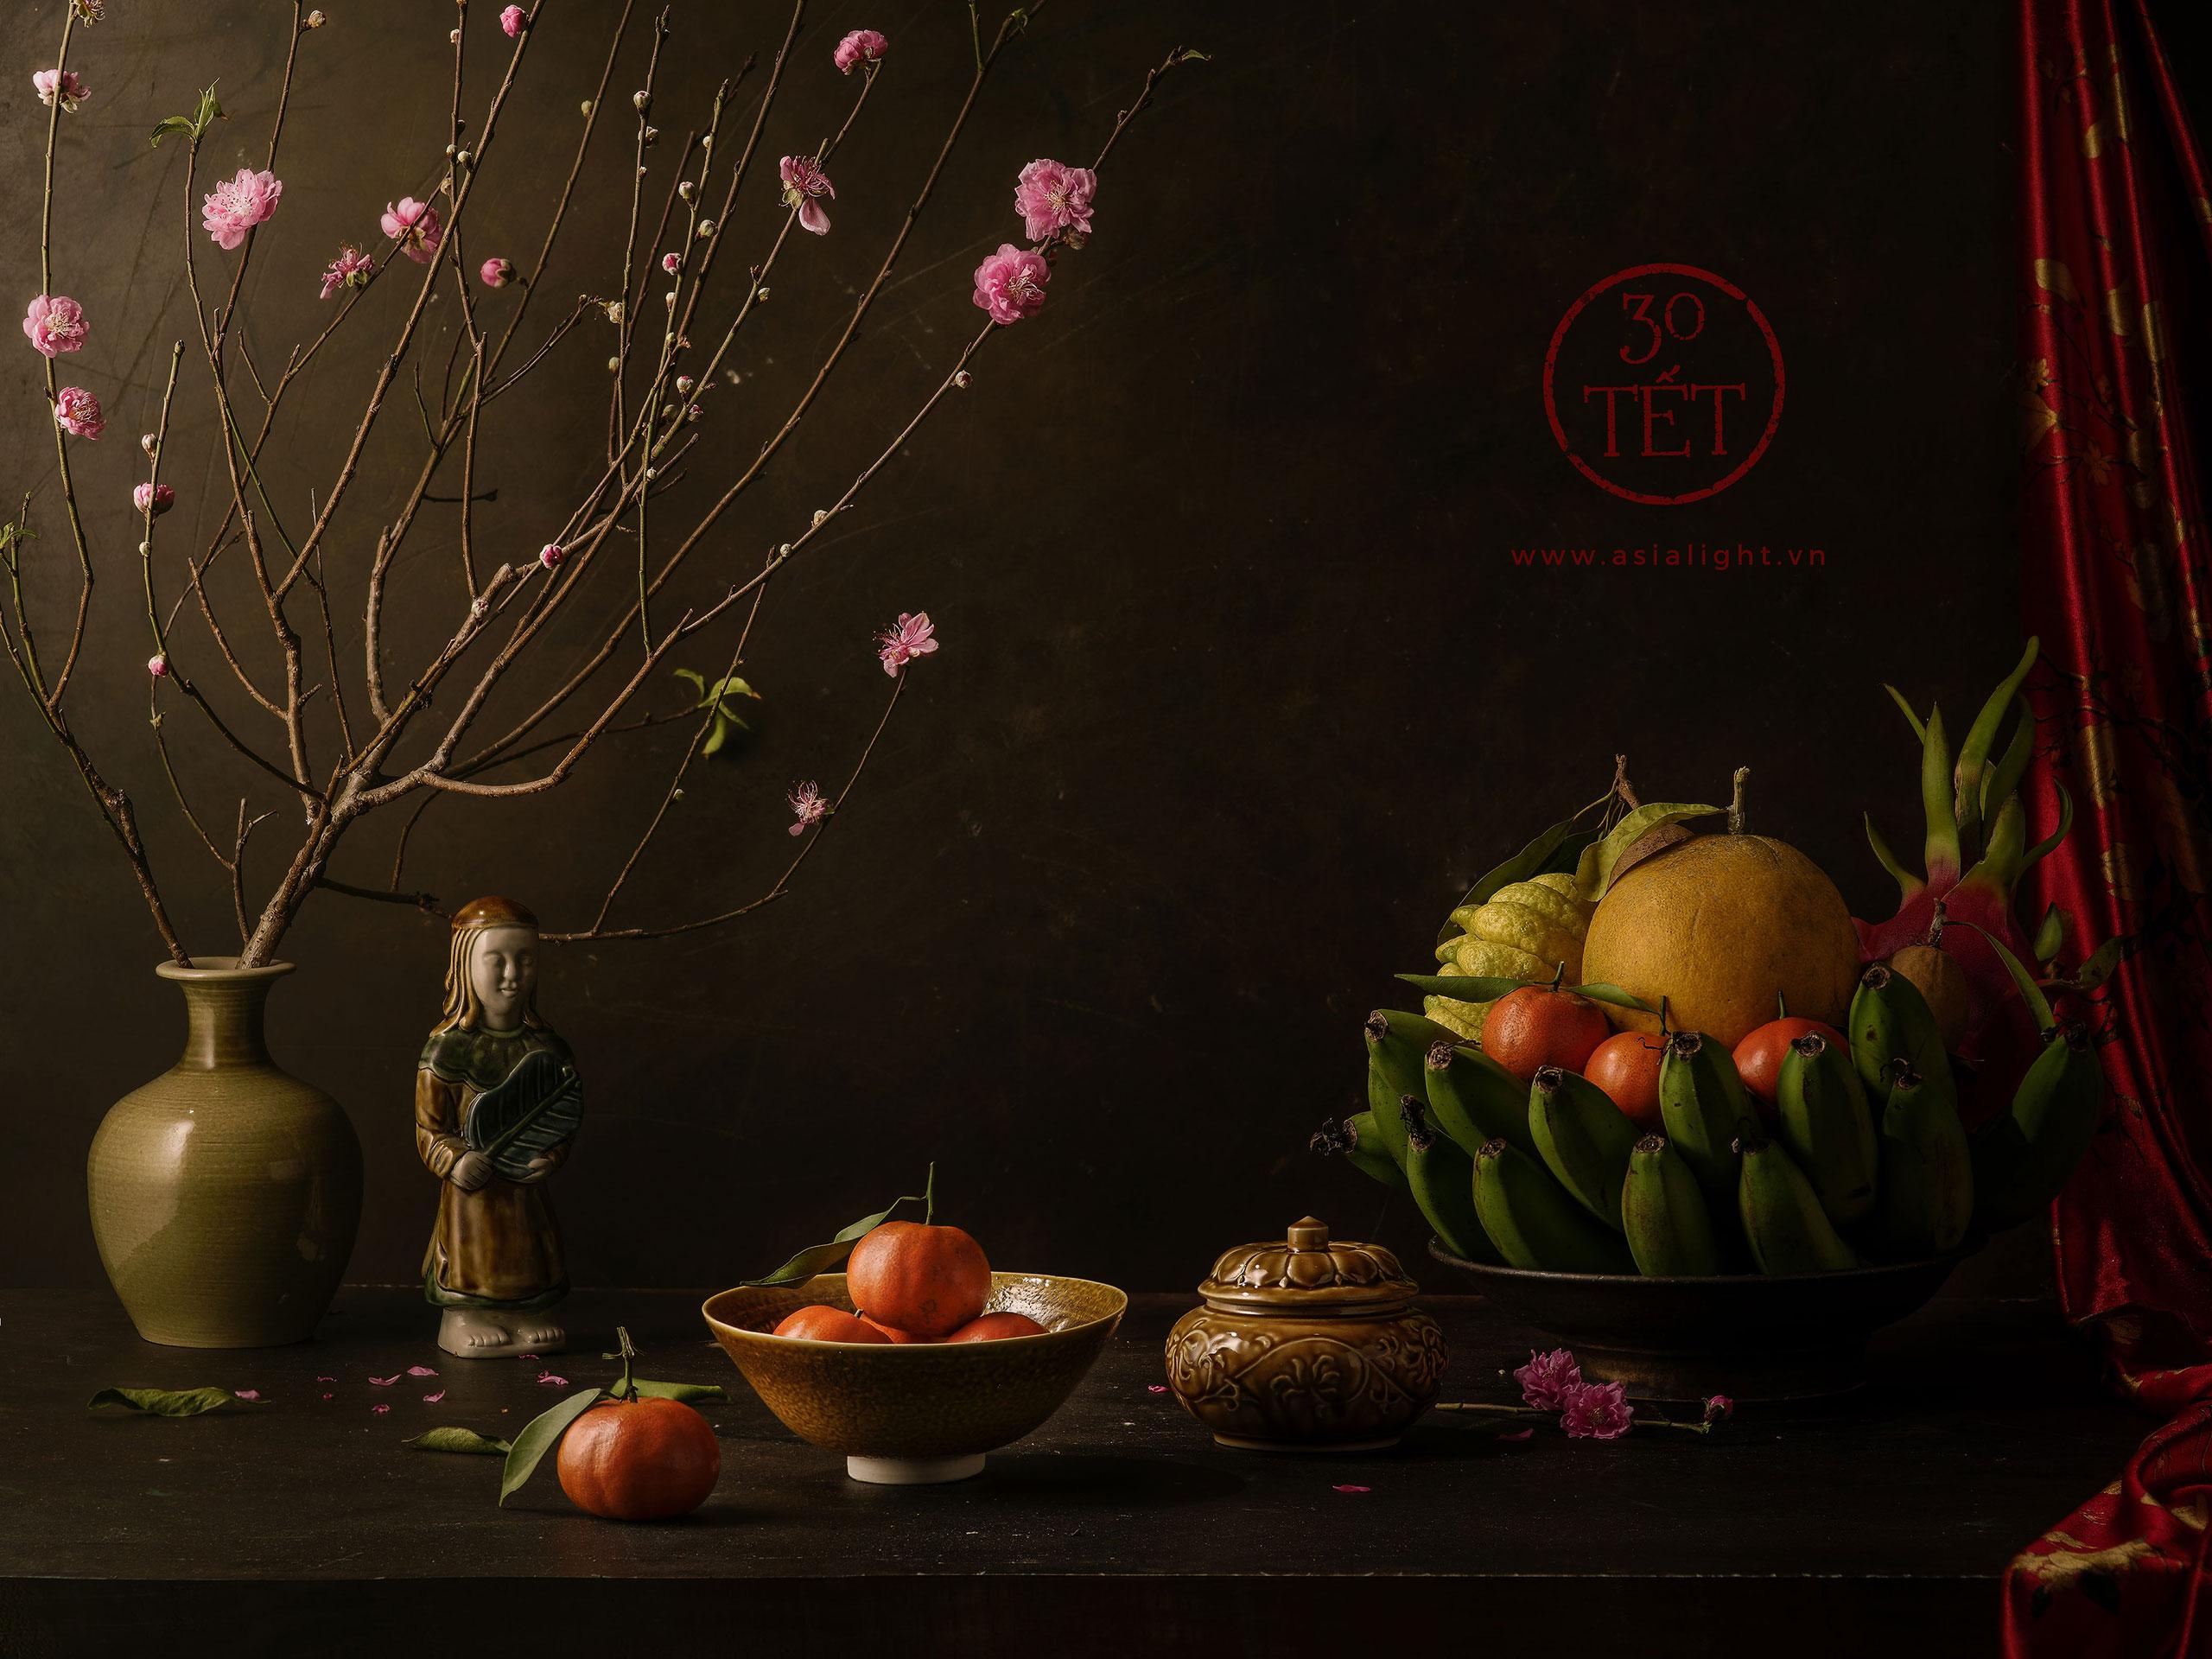 Lunar-New-Year-Vietnaml